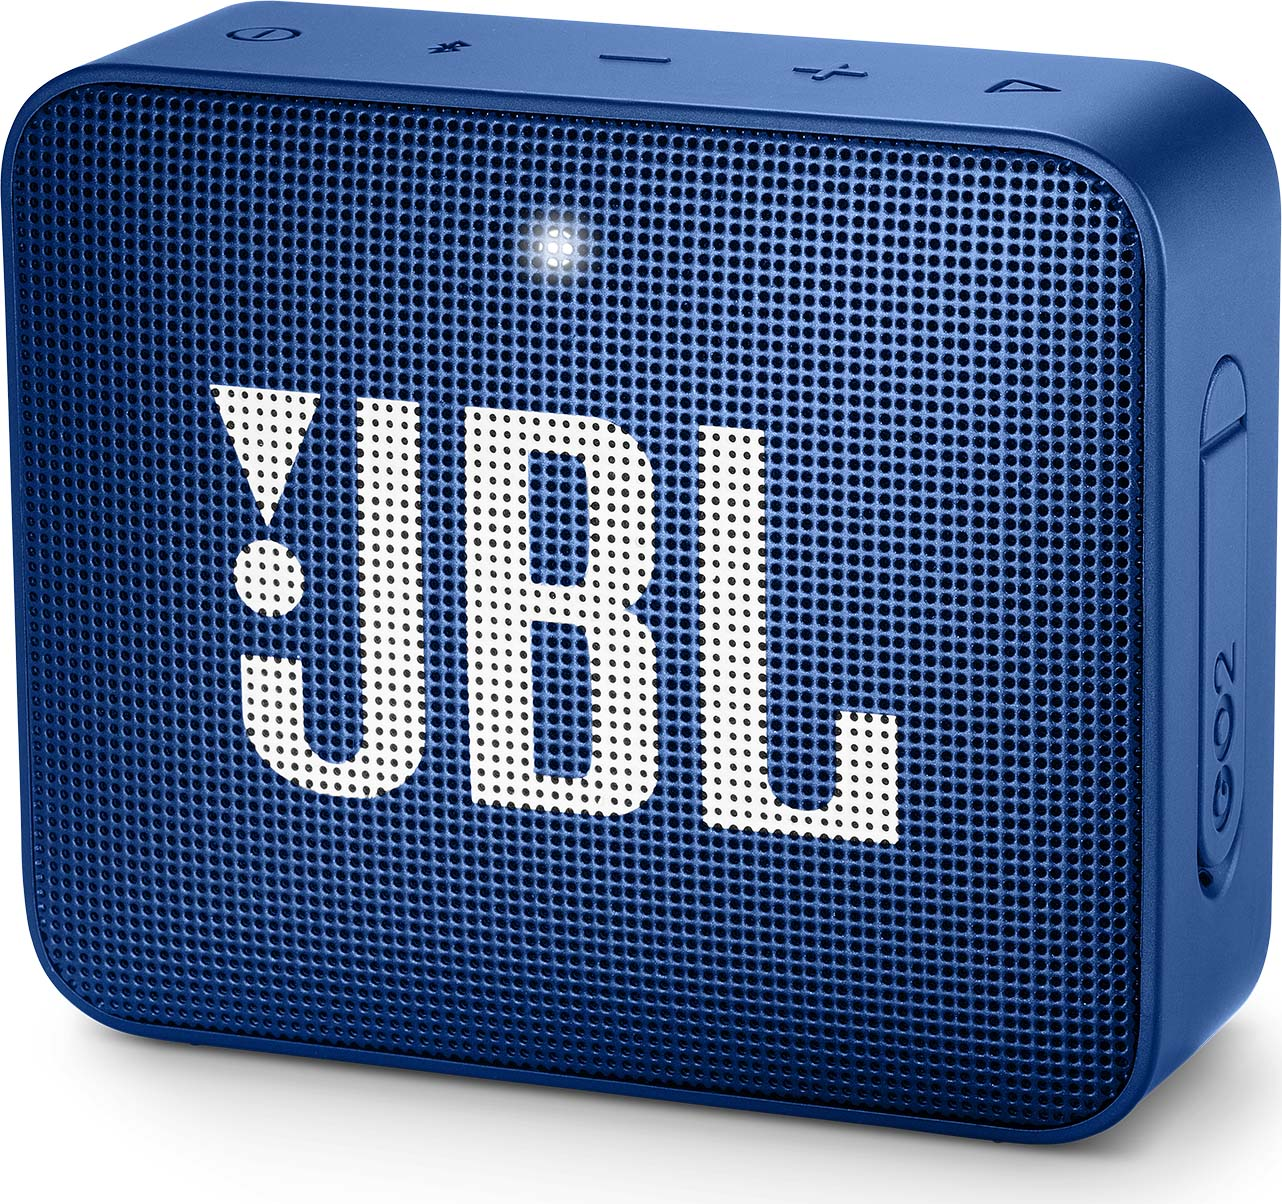 цена на Беспроводная колонка JBL Go 2, Blue